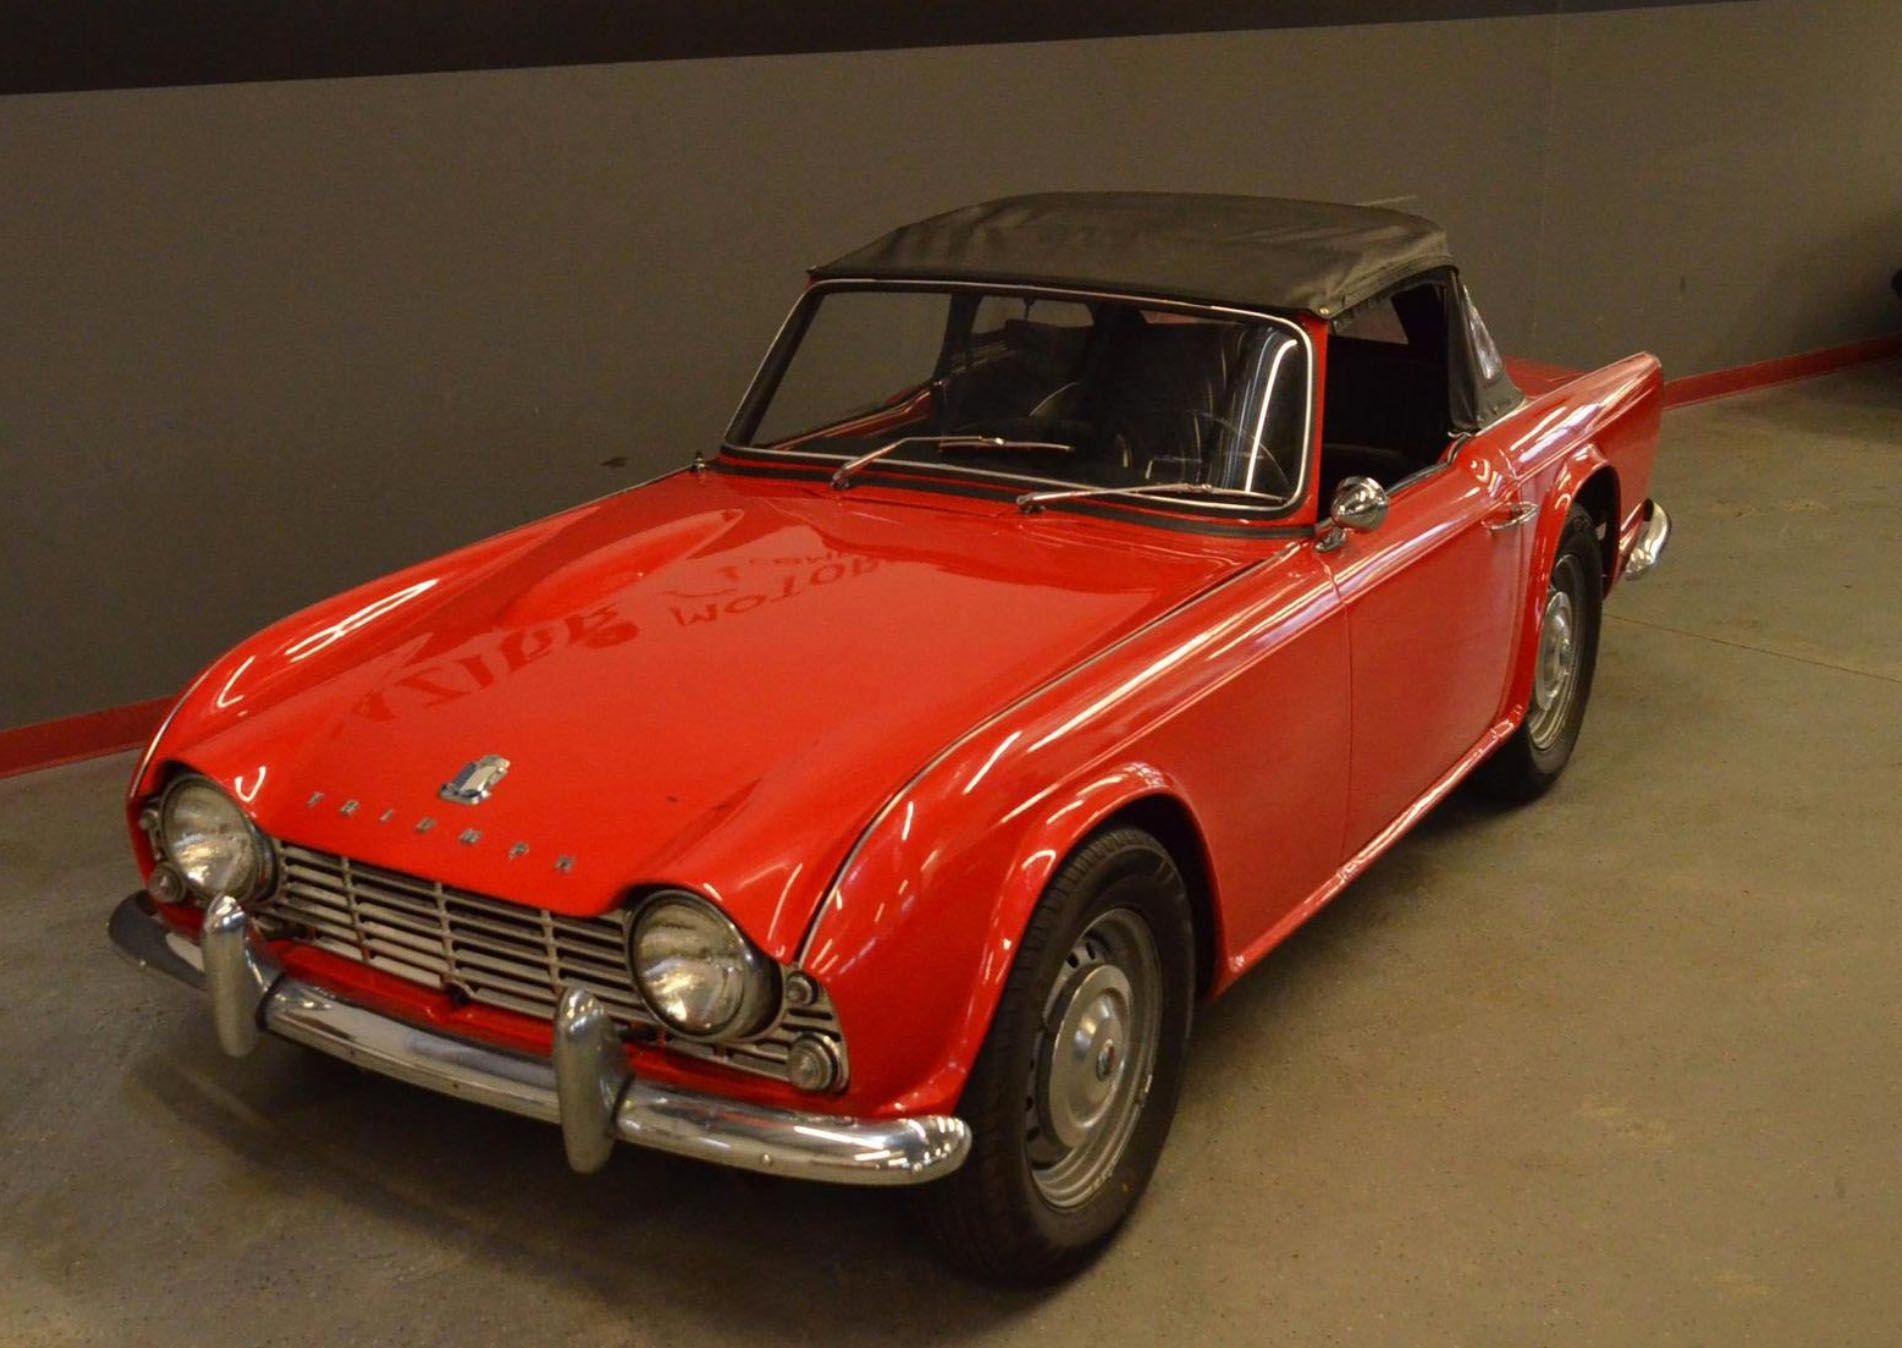 "<img src=""1970-triumph-tr4.jpg"" alt=""The front three quarters of a 1970 Triumph TR4"">"